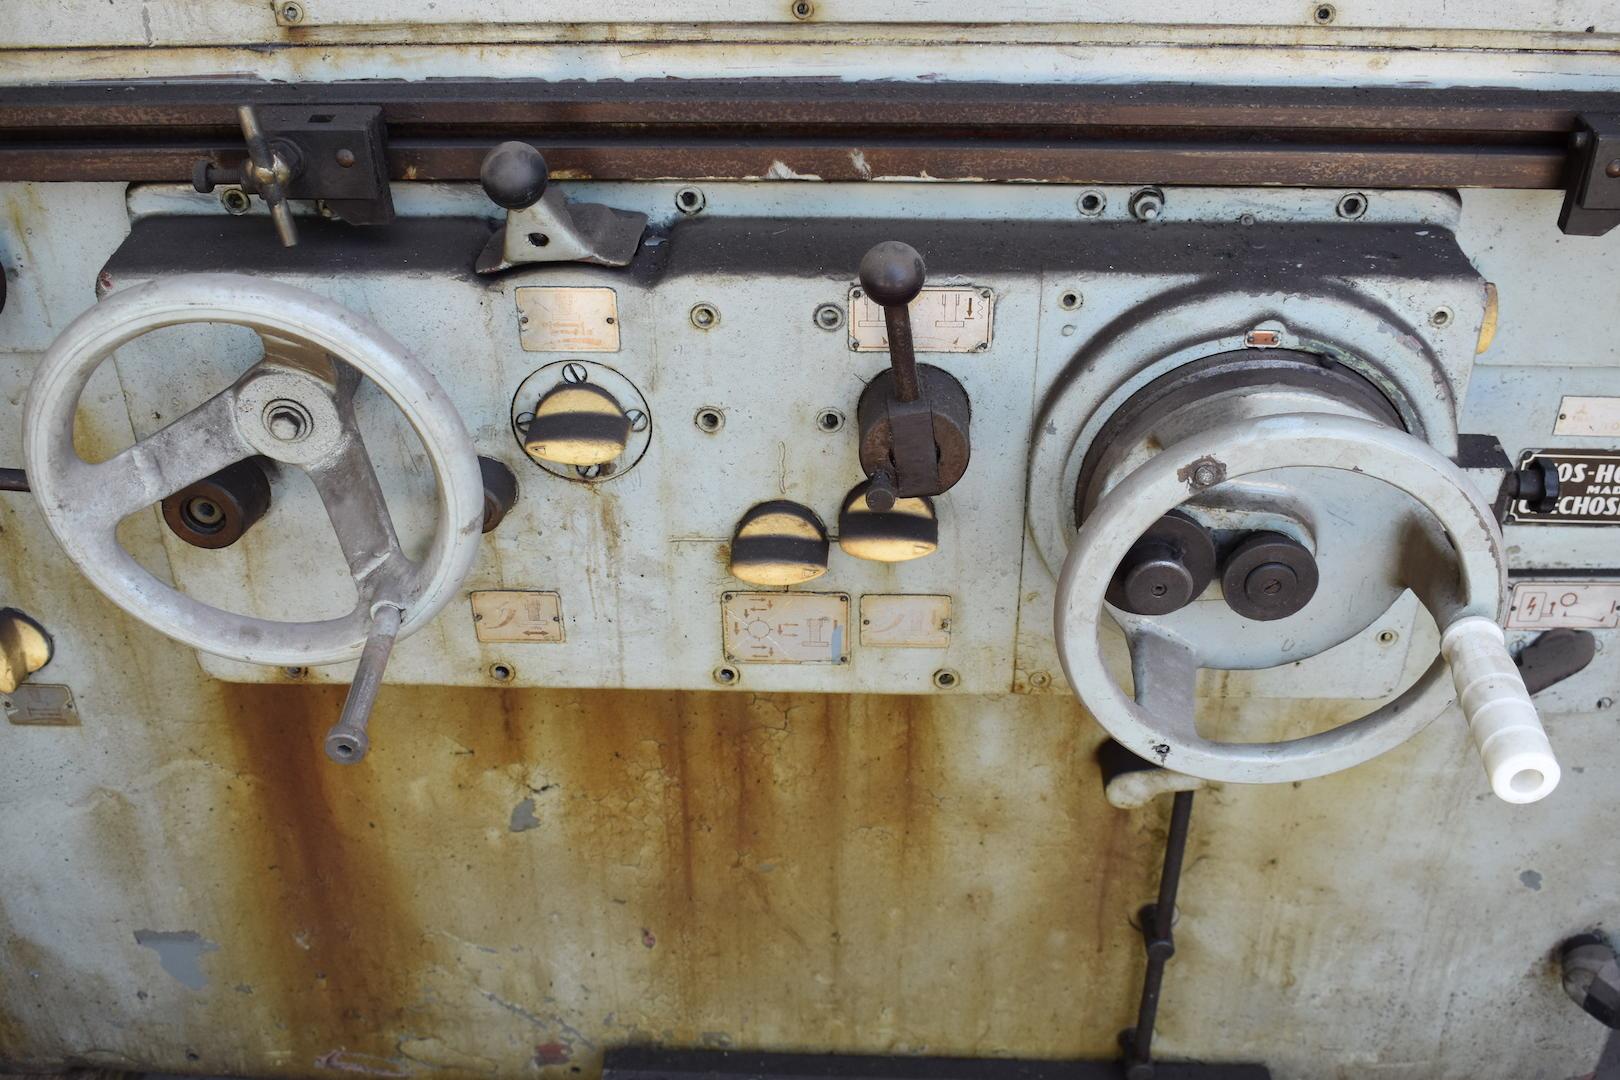 Lot 91 - Tos-Hostivar 18 in. Type 2UD-500 Universal Cylindrical Grinder, S/N 17623, Drop Down Internal